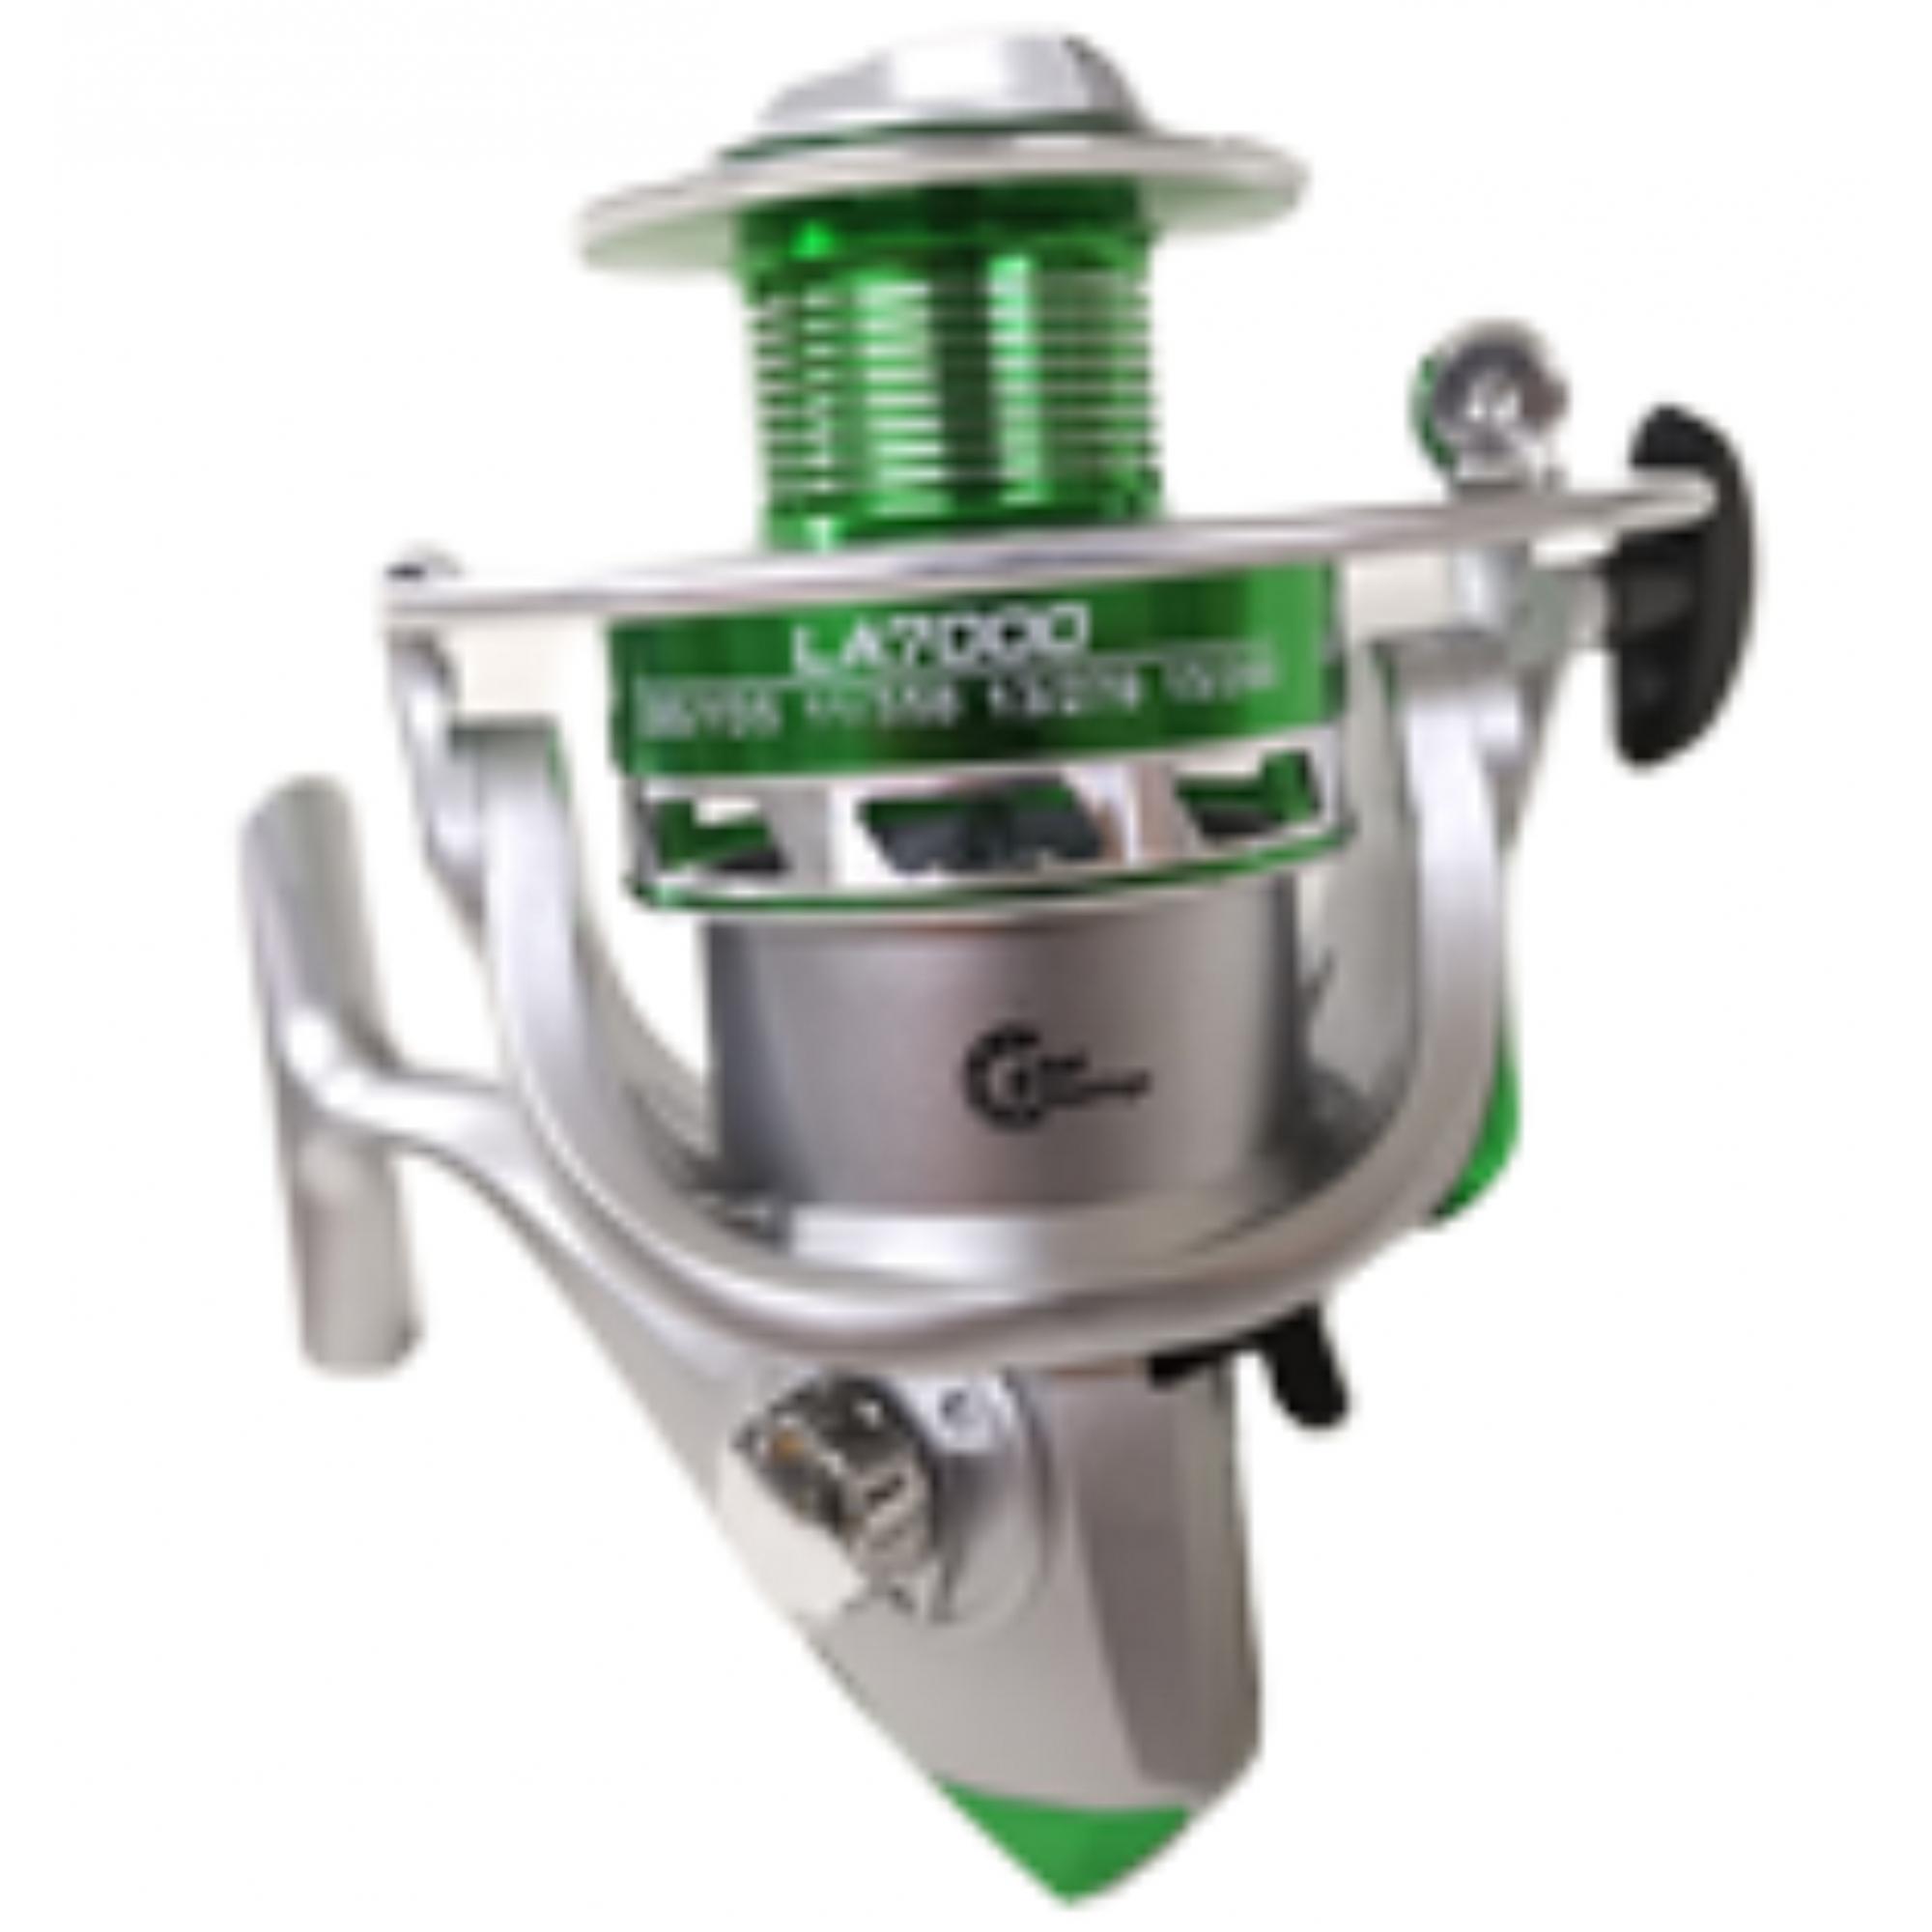 Molinete 4000 LA 6 Rolamento Carretel Alumínio Drag 4,5kg